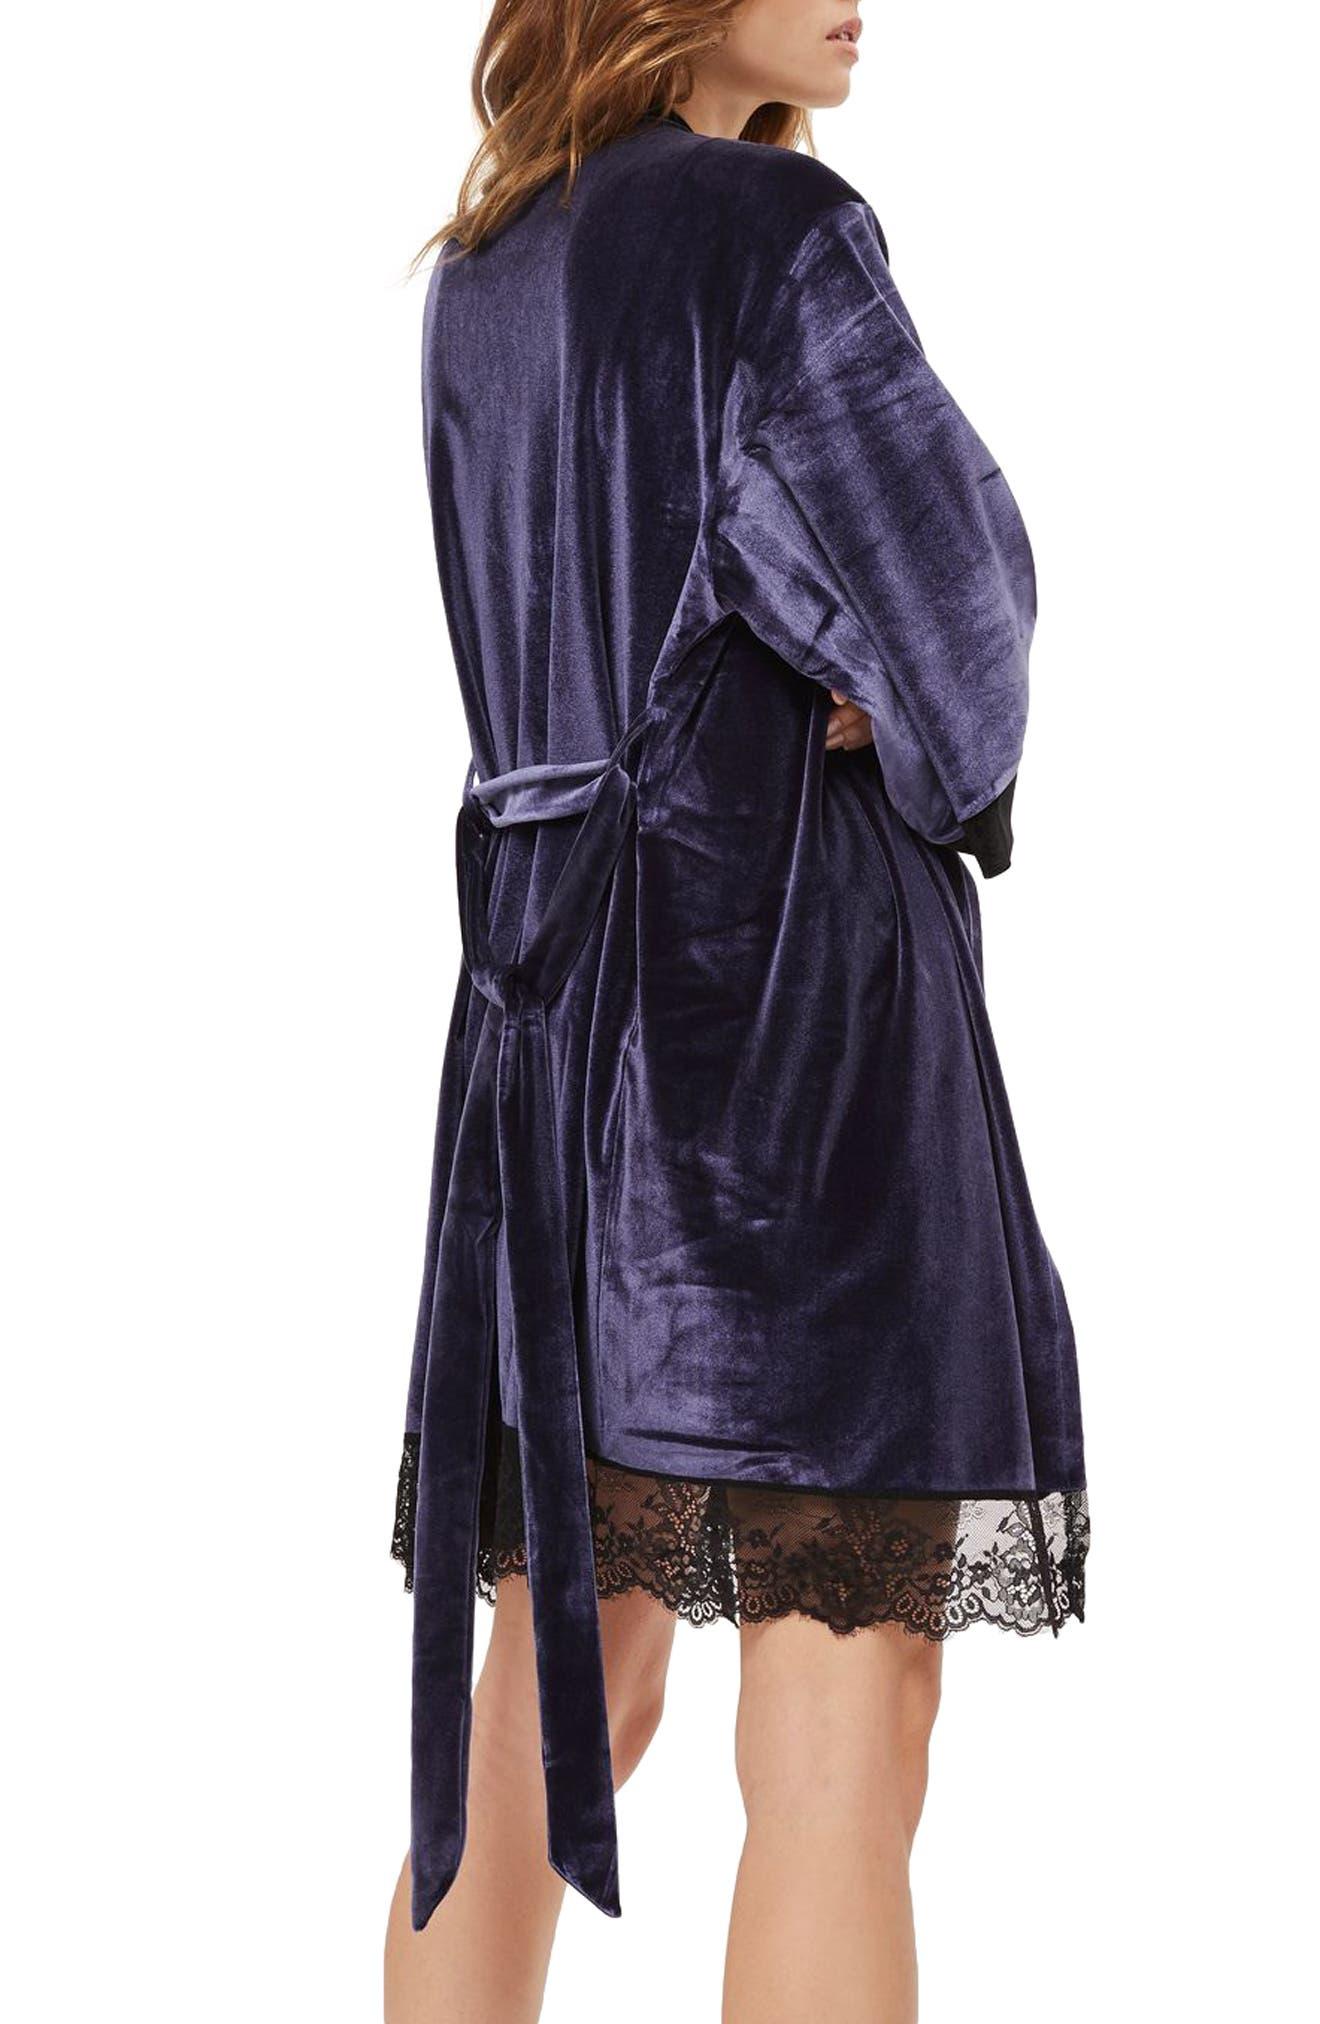 Nocturne Lace and Velvet Robe,                             Alternate thumbnail 2, color,                             410